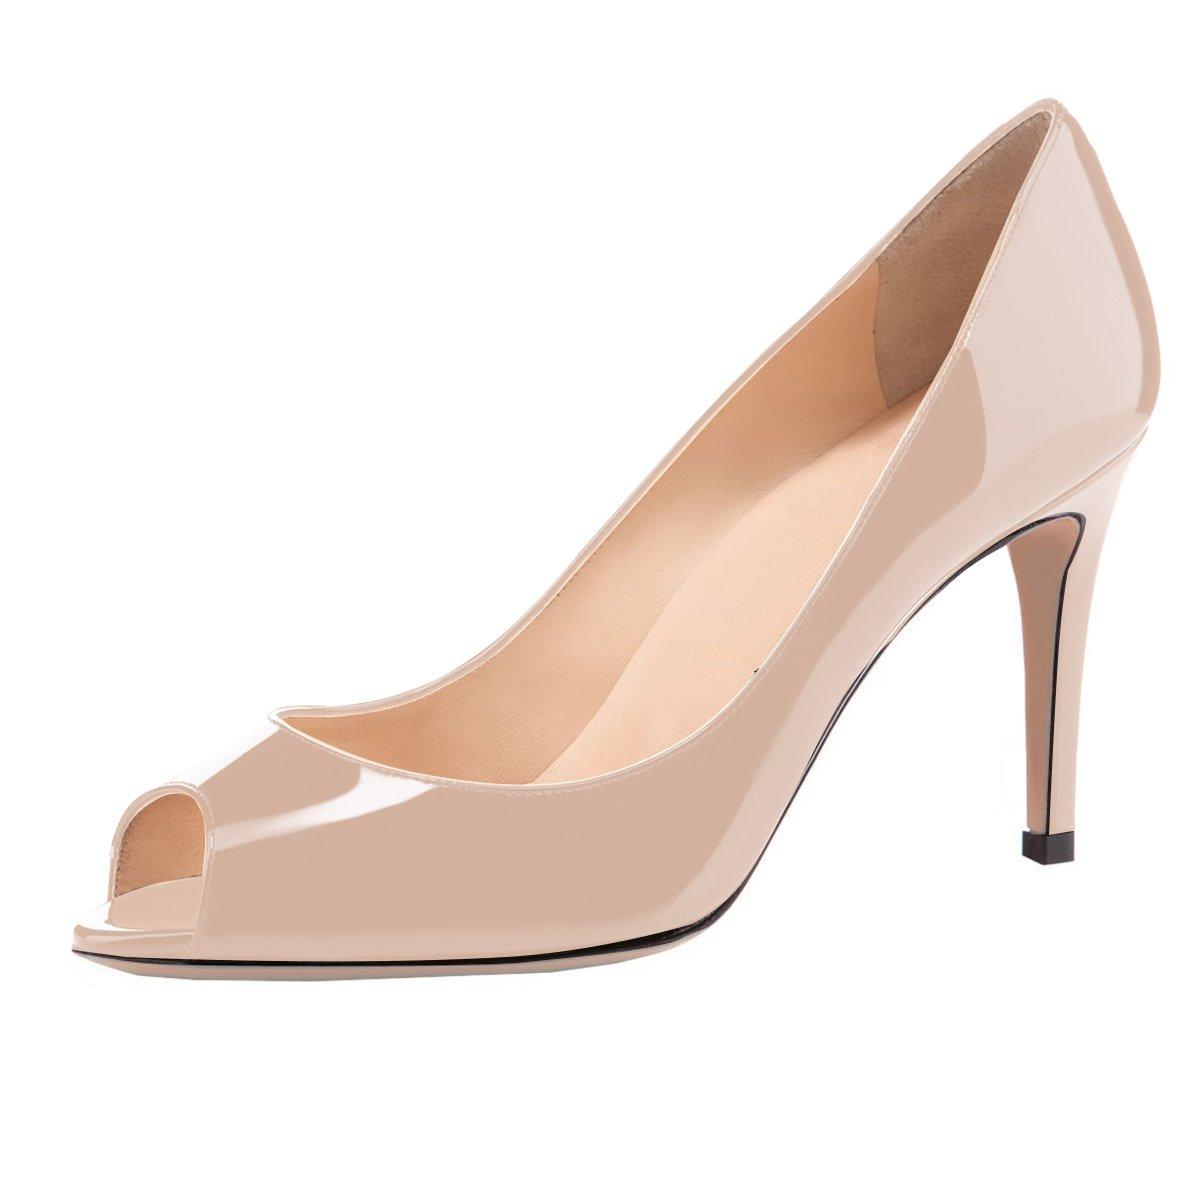 Eldof Women Peep Toe Pumps Mid-Heel Pumps Formal Wedding Bridal Classic Heel Open Toe Stiletto B07F1QNQGR 9.5 B(M) US|Beige